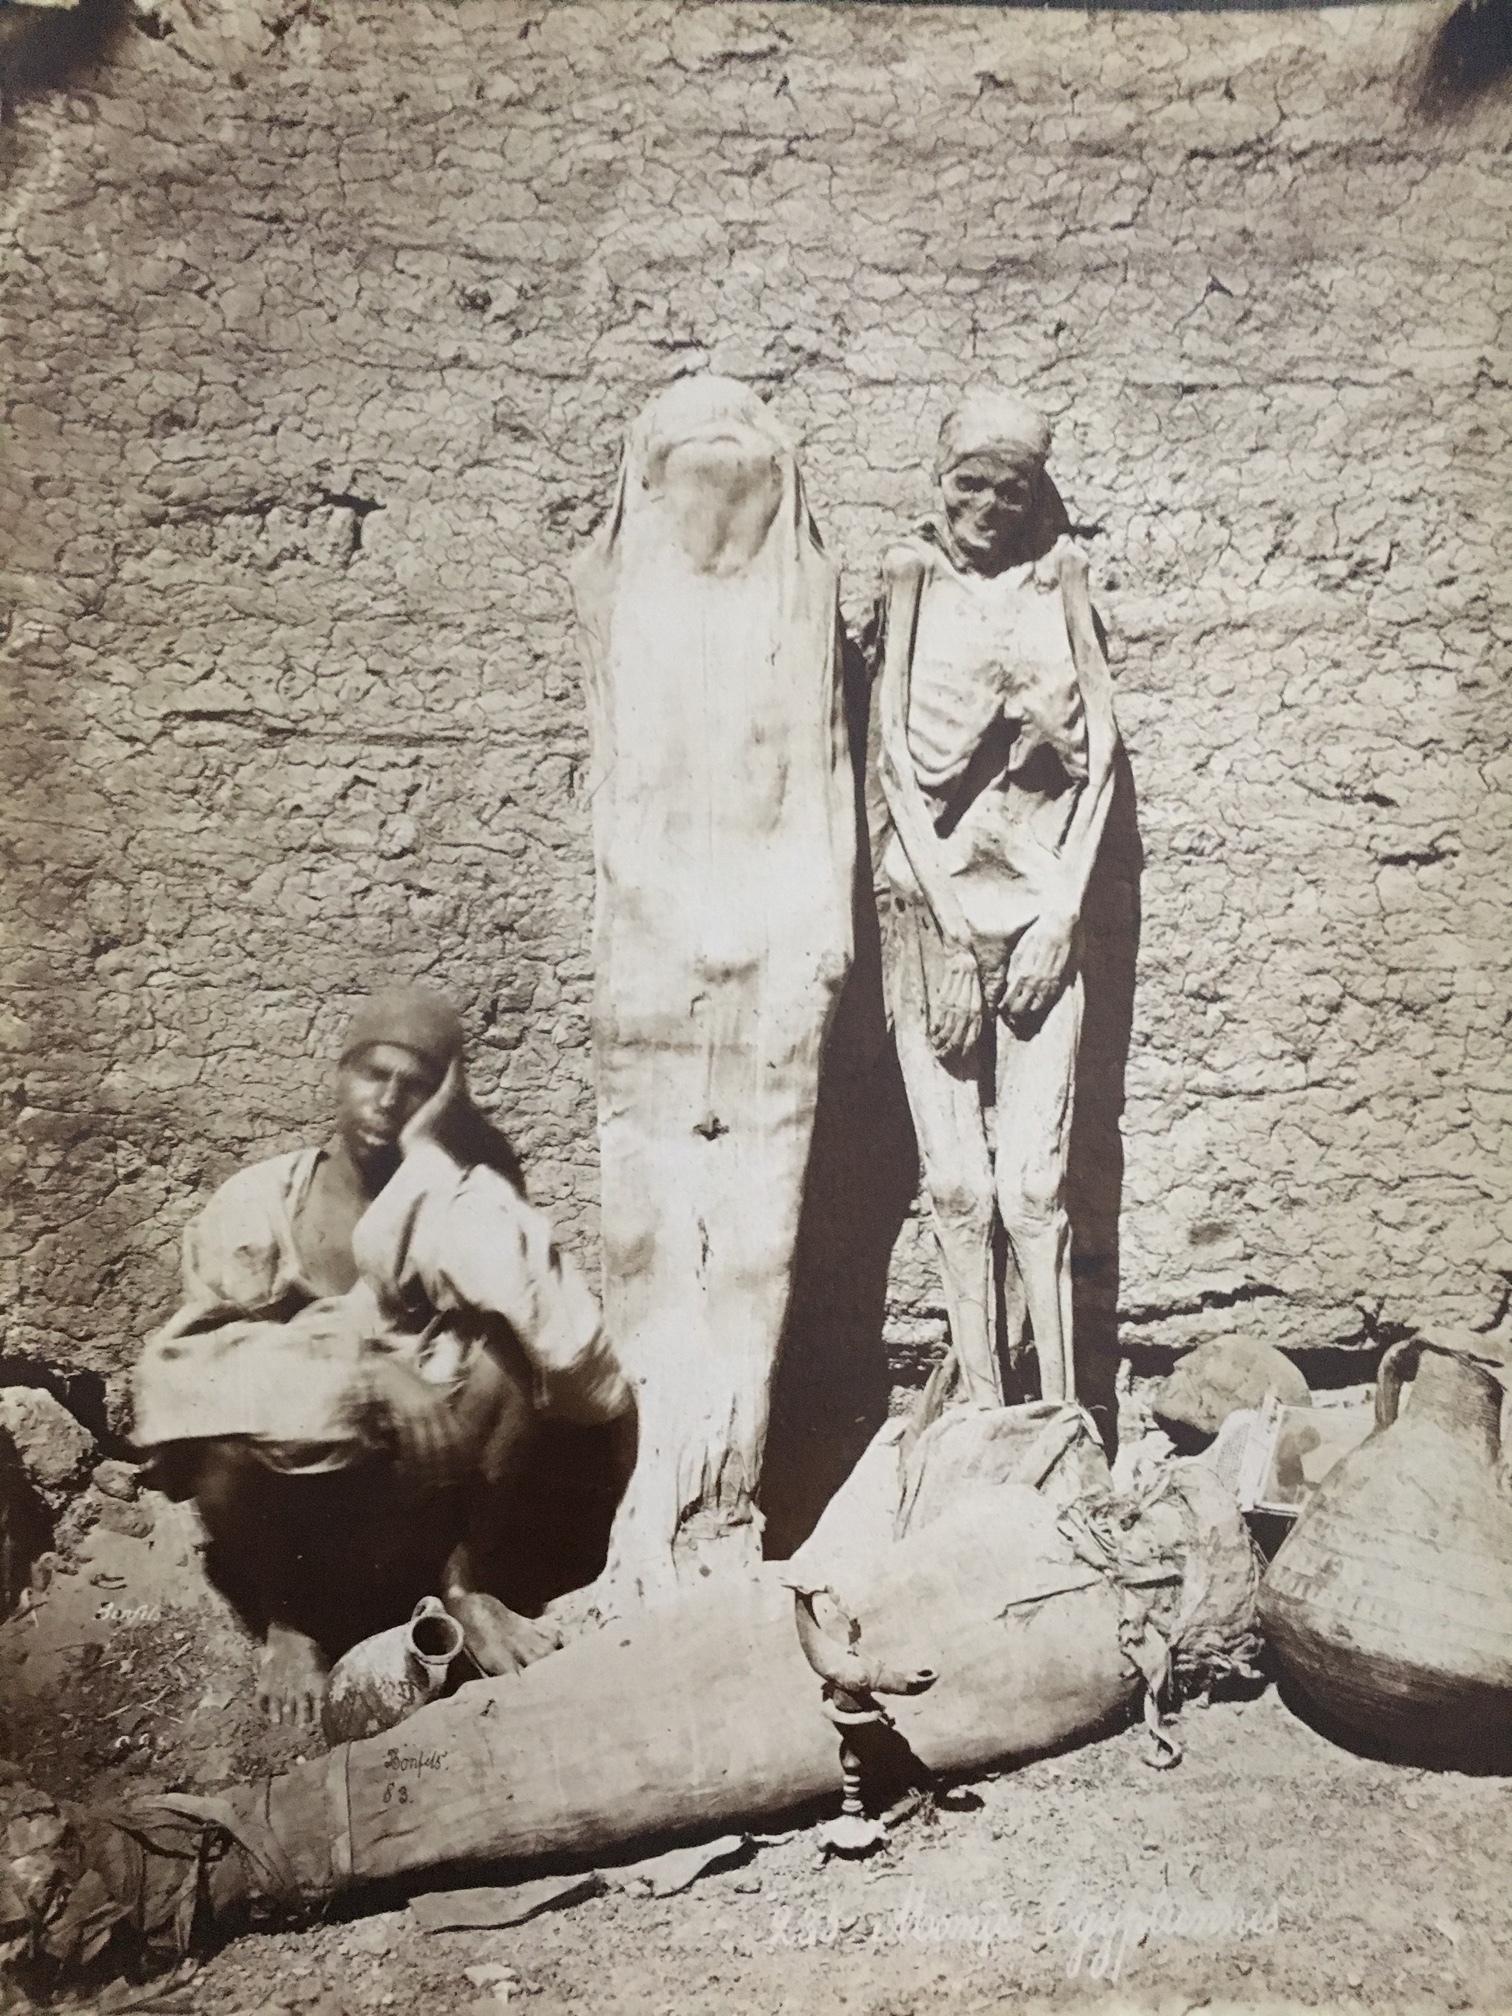 Mummy Seller